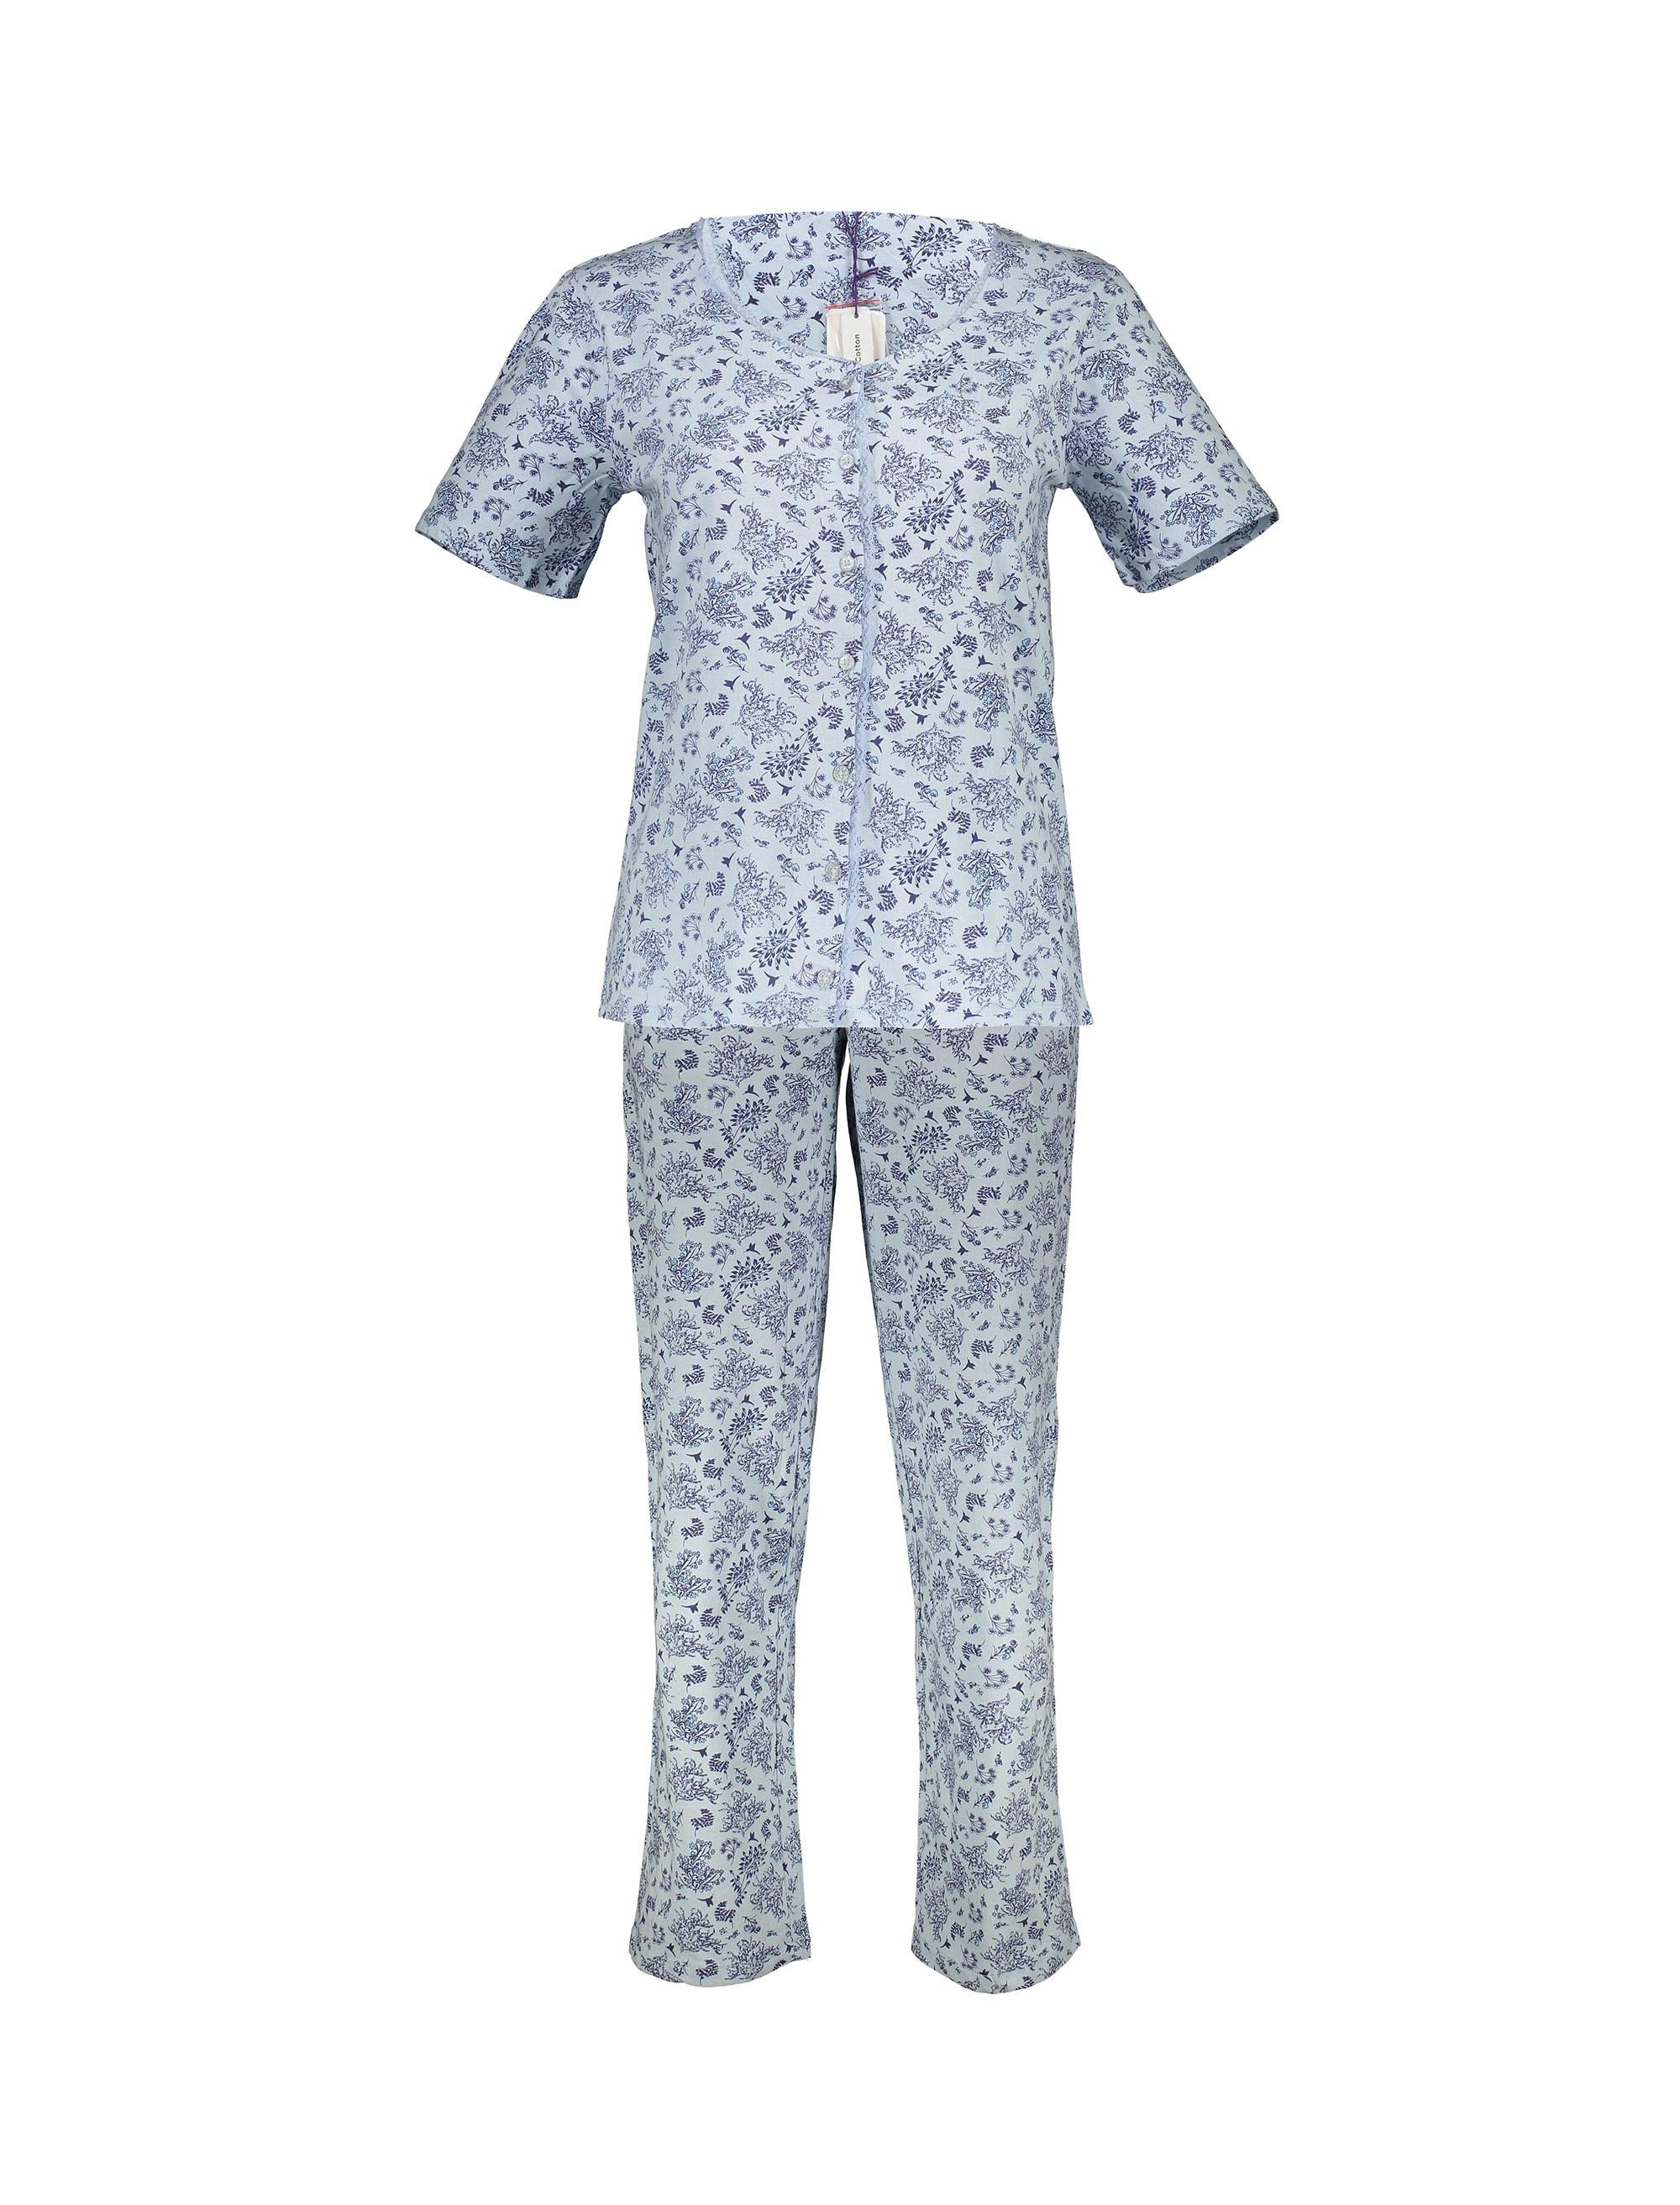 تی شرت و شلوار راحتی نخی زنانه | Women Cotton T-shirt and Pants